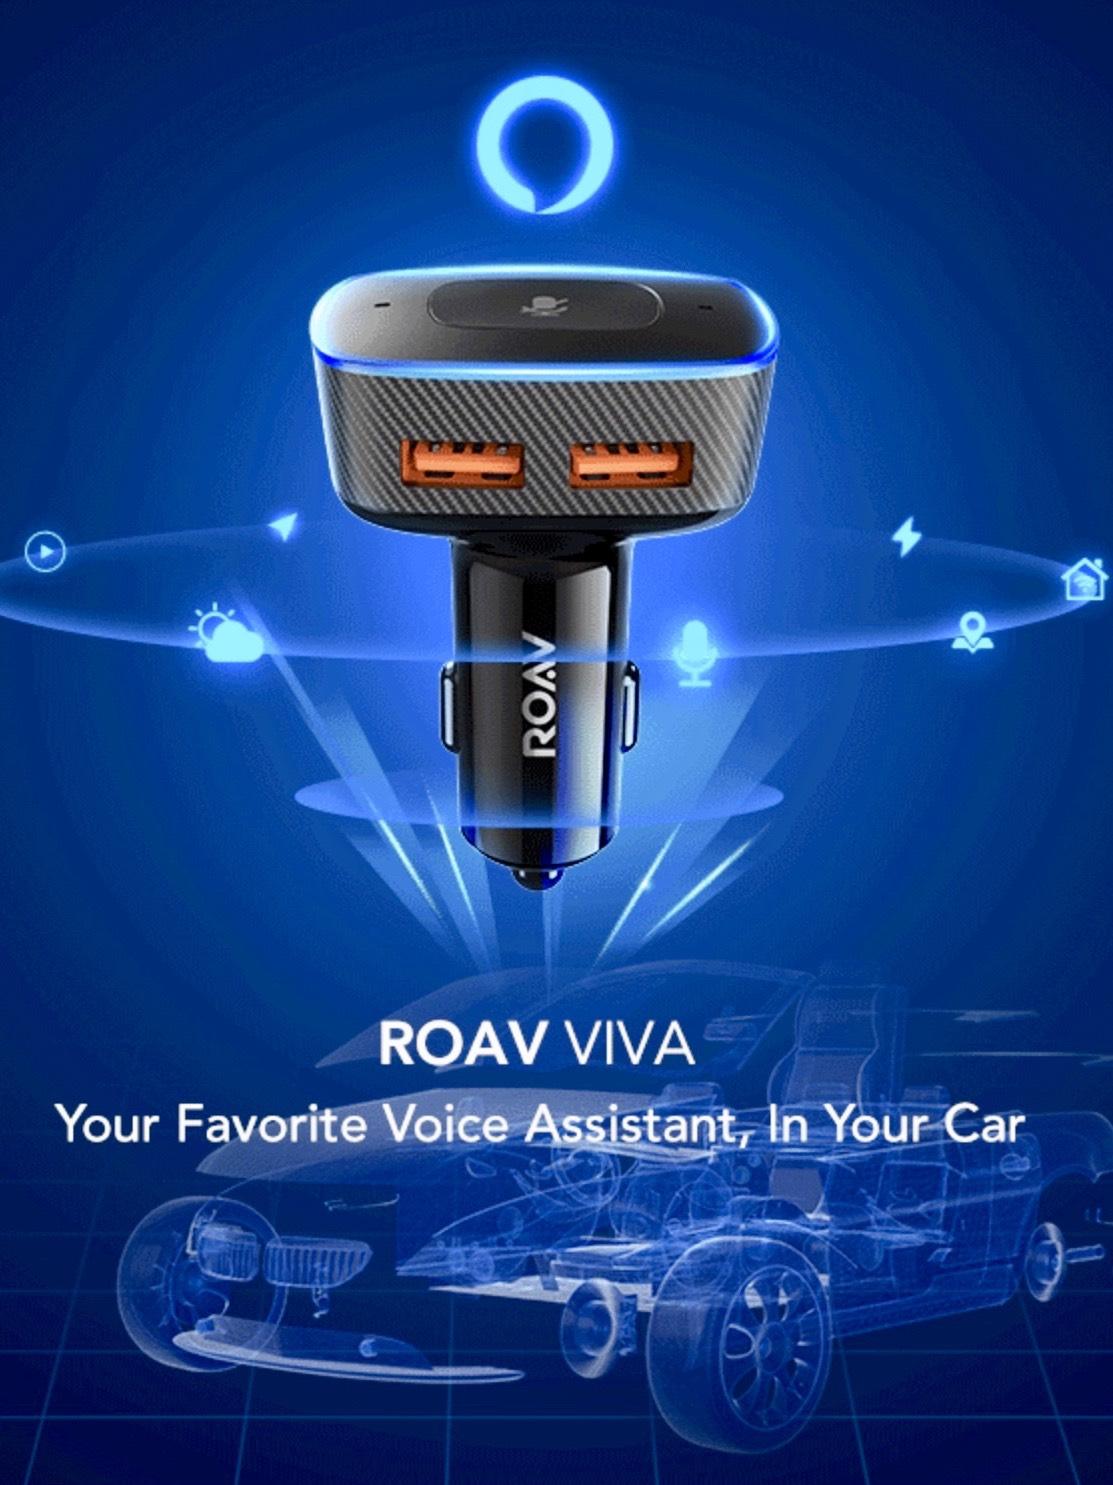 Anker Roav VIVA (Echo / Alexa fürs Auto) für nur 37,49 €